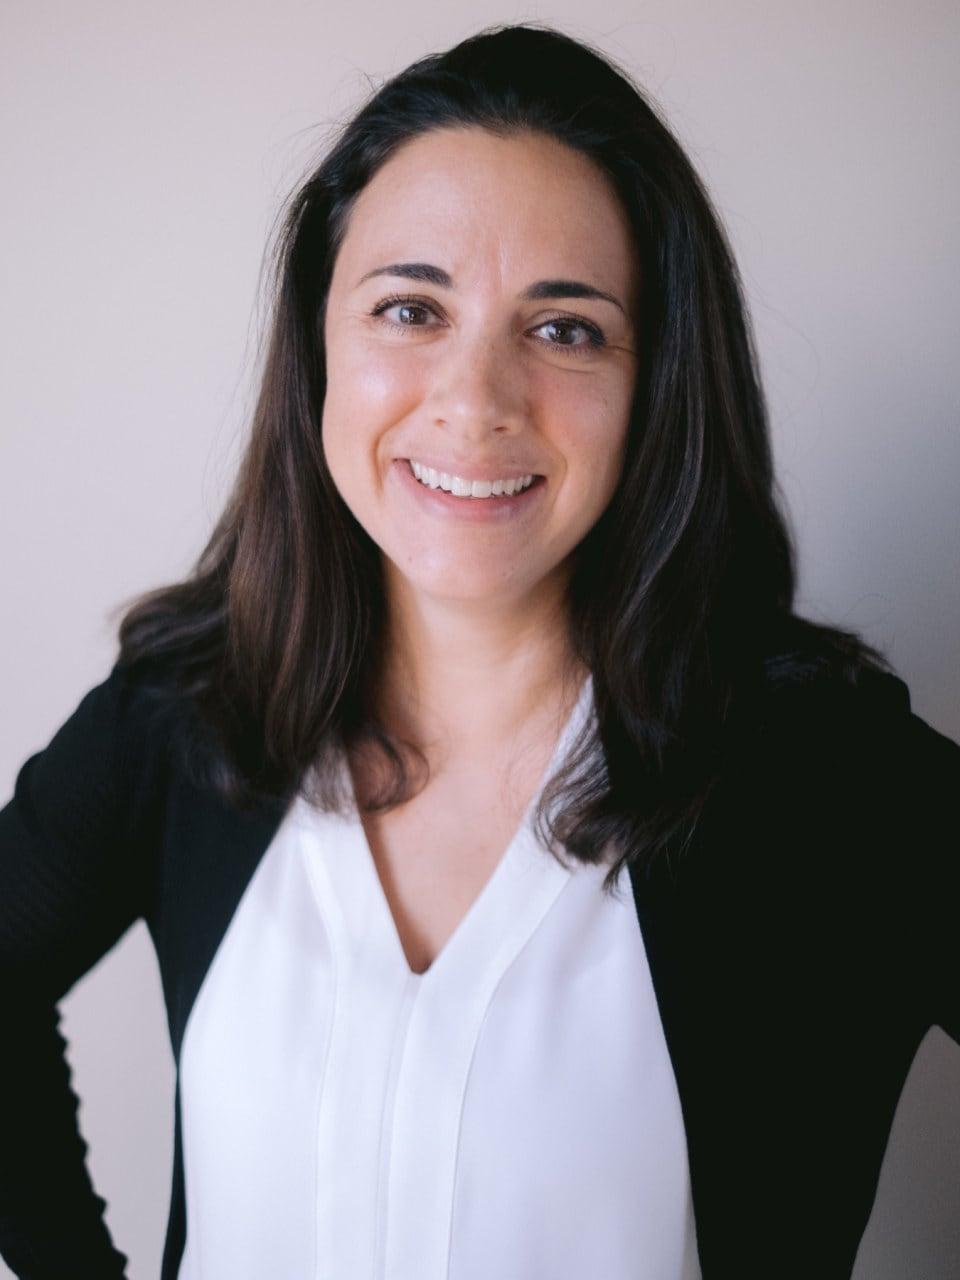 Allison Cianci